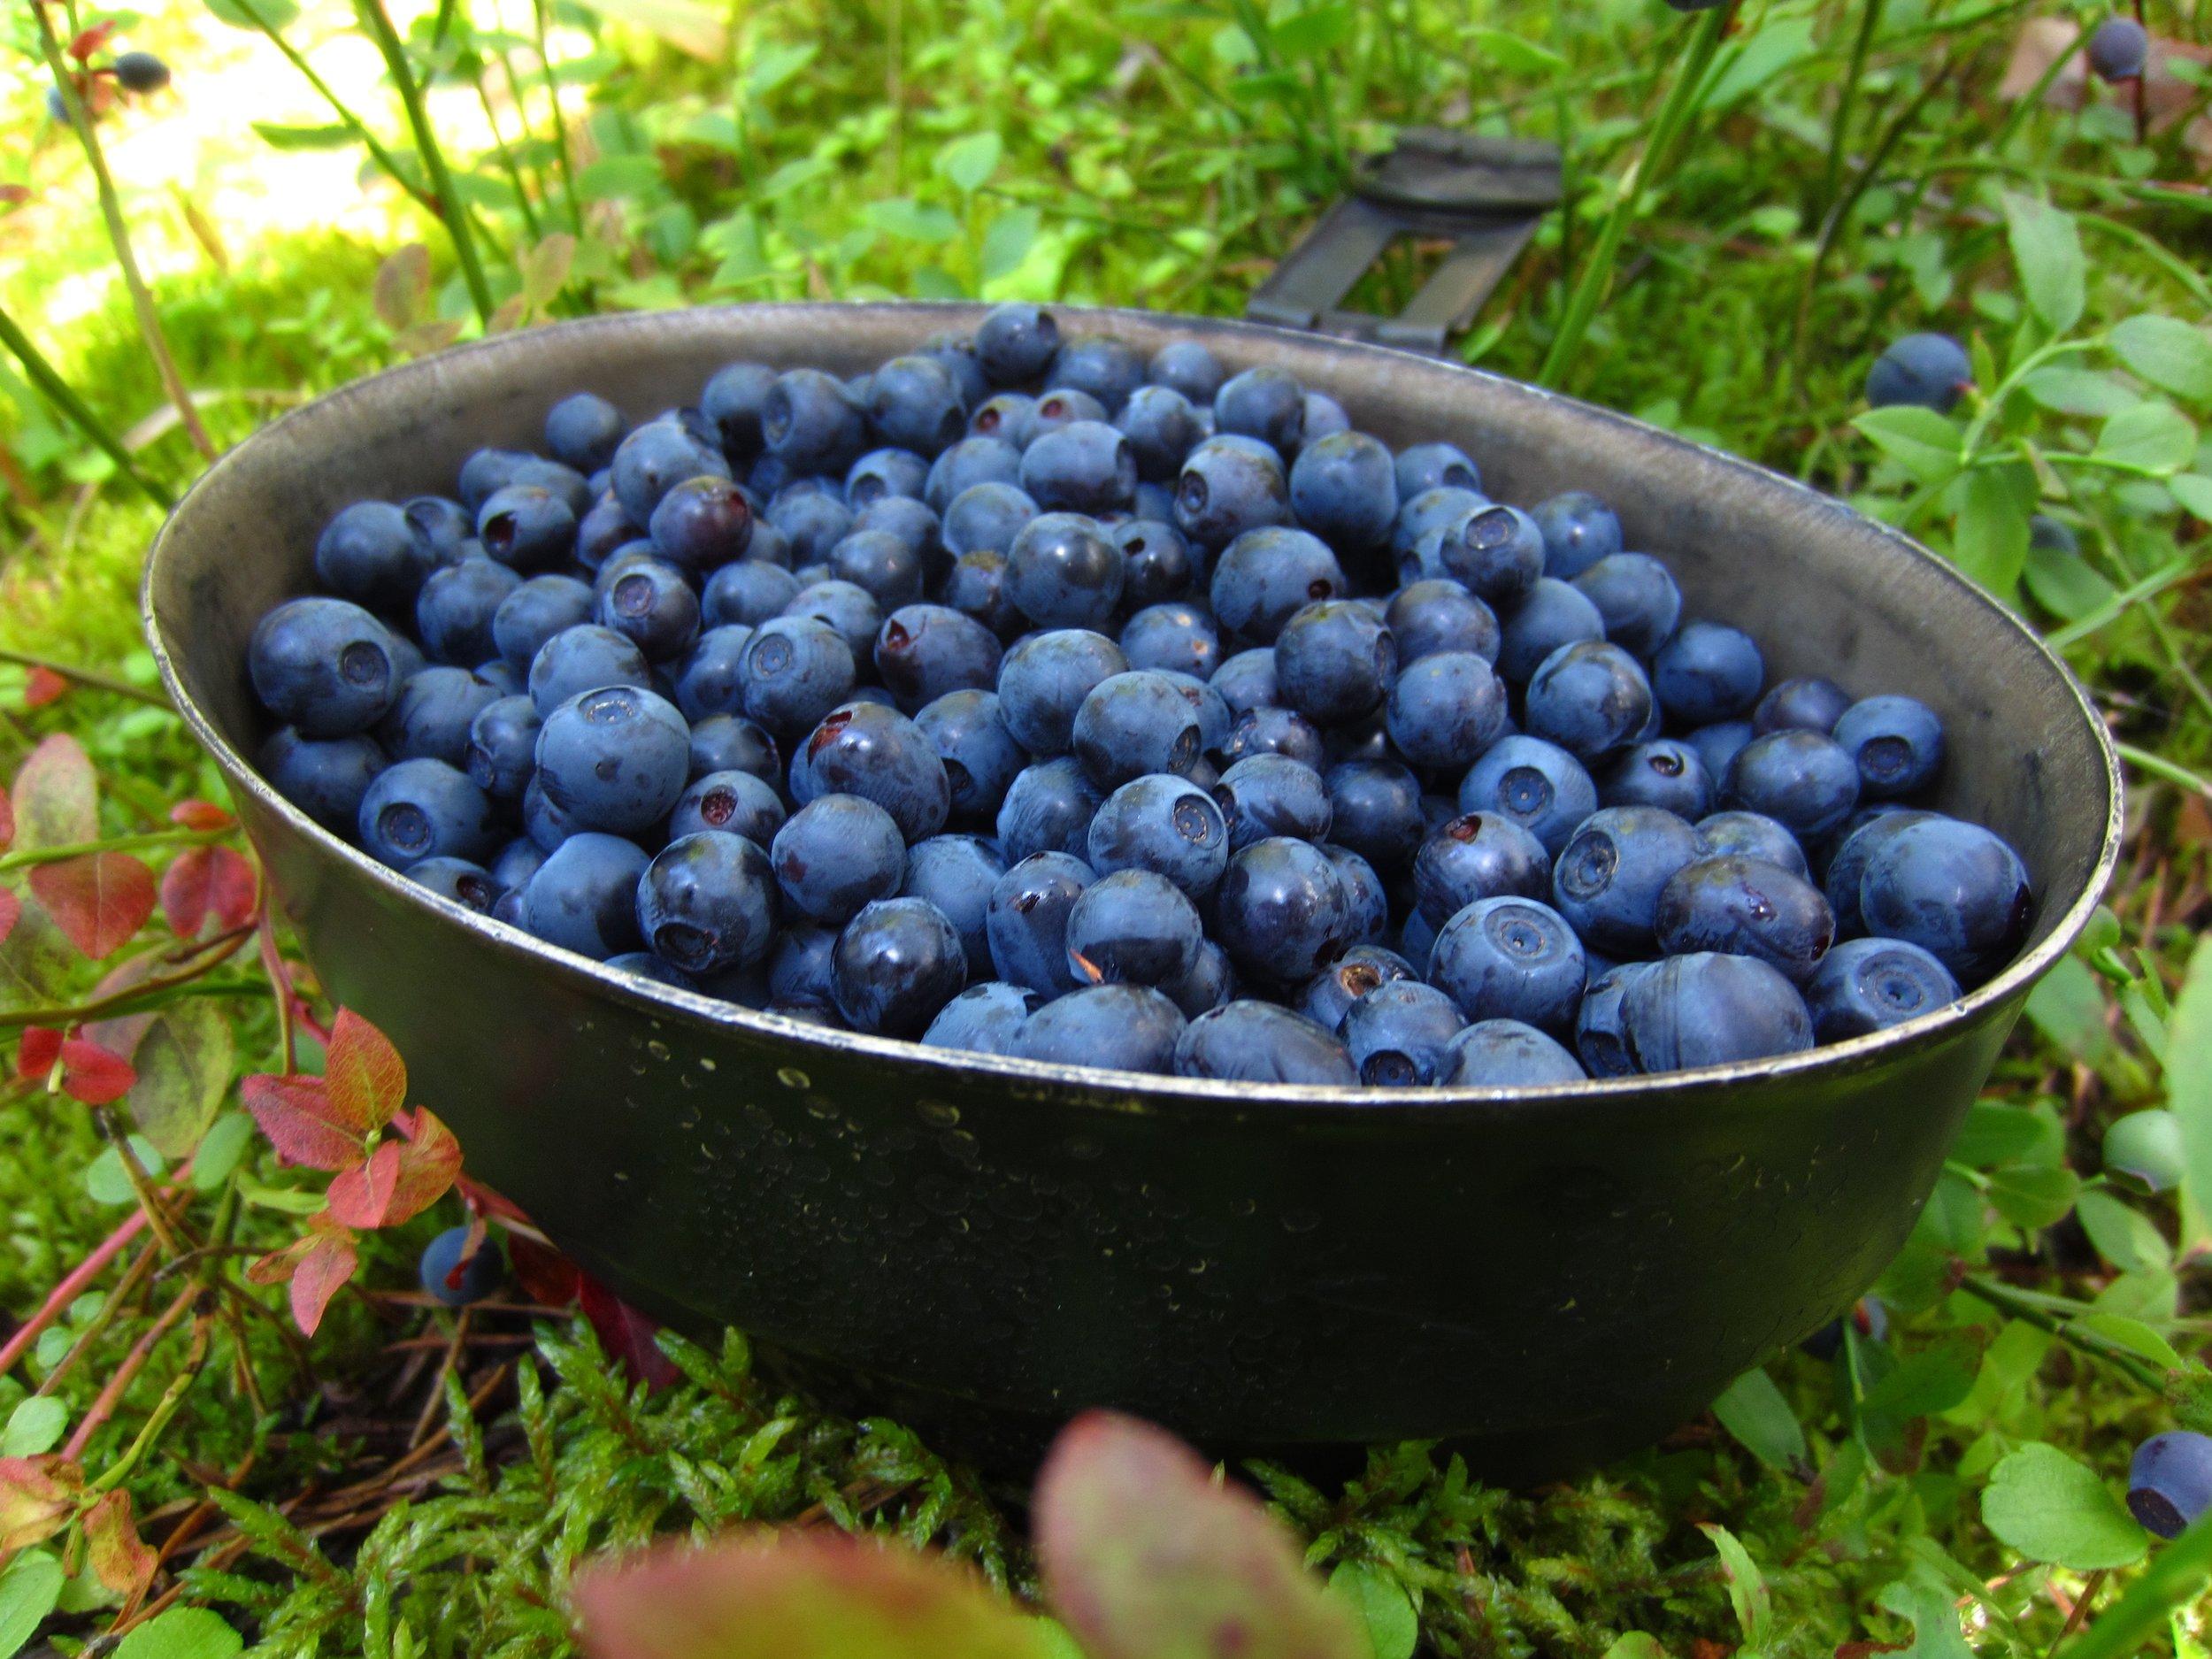 Berry picking trip blueberries Nuuksio National Park